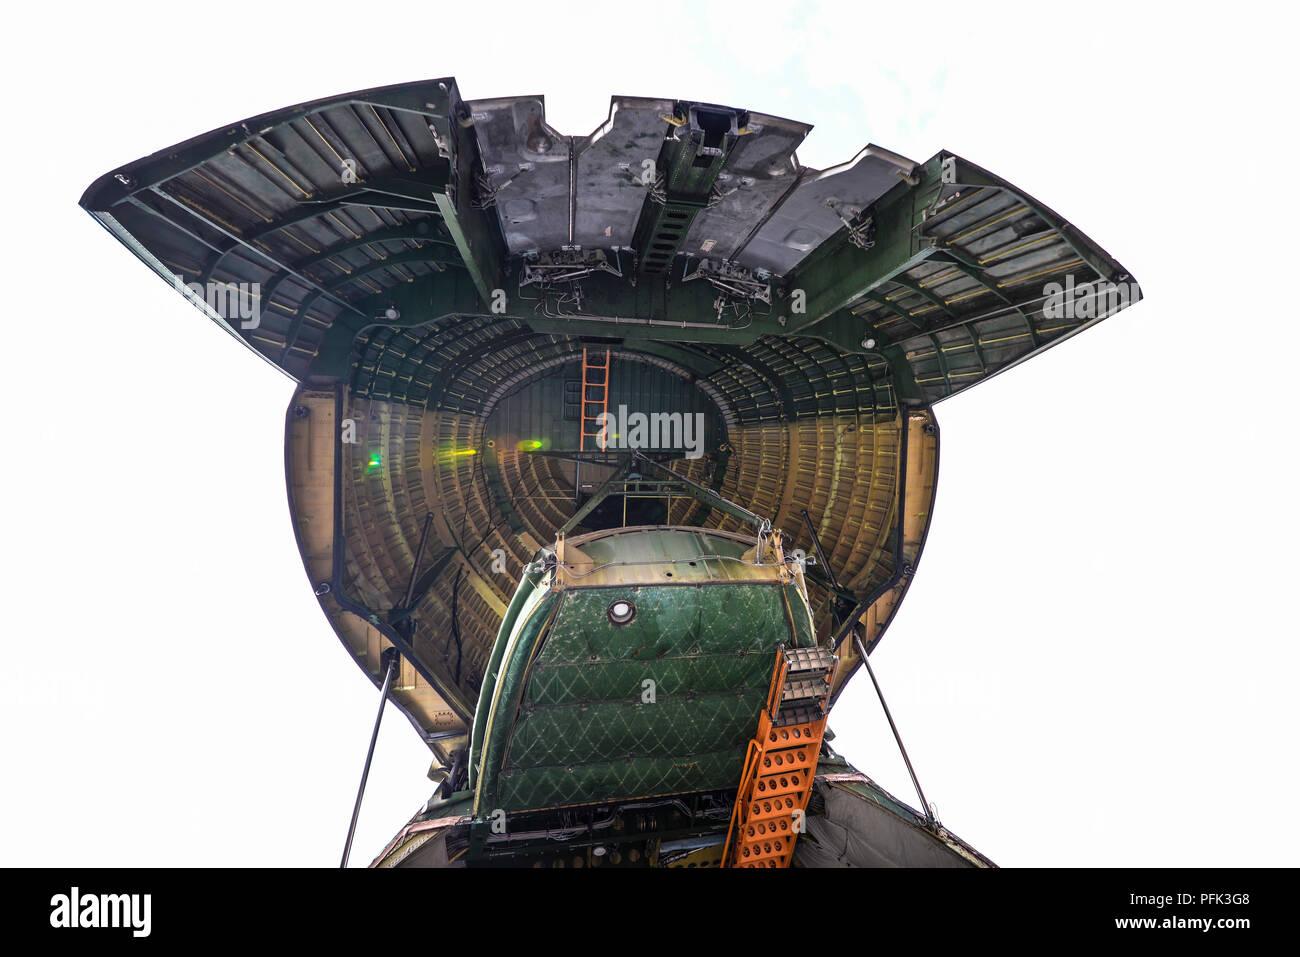 inside-the-huge-raised-nose-door-of-a-antonov-an-124-plane-at-farnborough-international-airshow-aerospace-aviation-trade-show-cavernous-cargo-door-PFK3G8.jpg